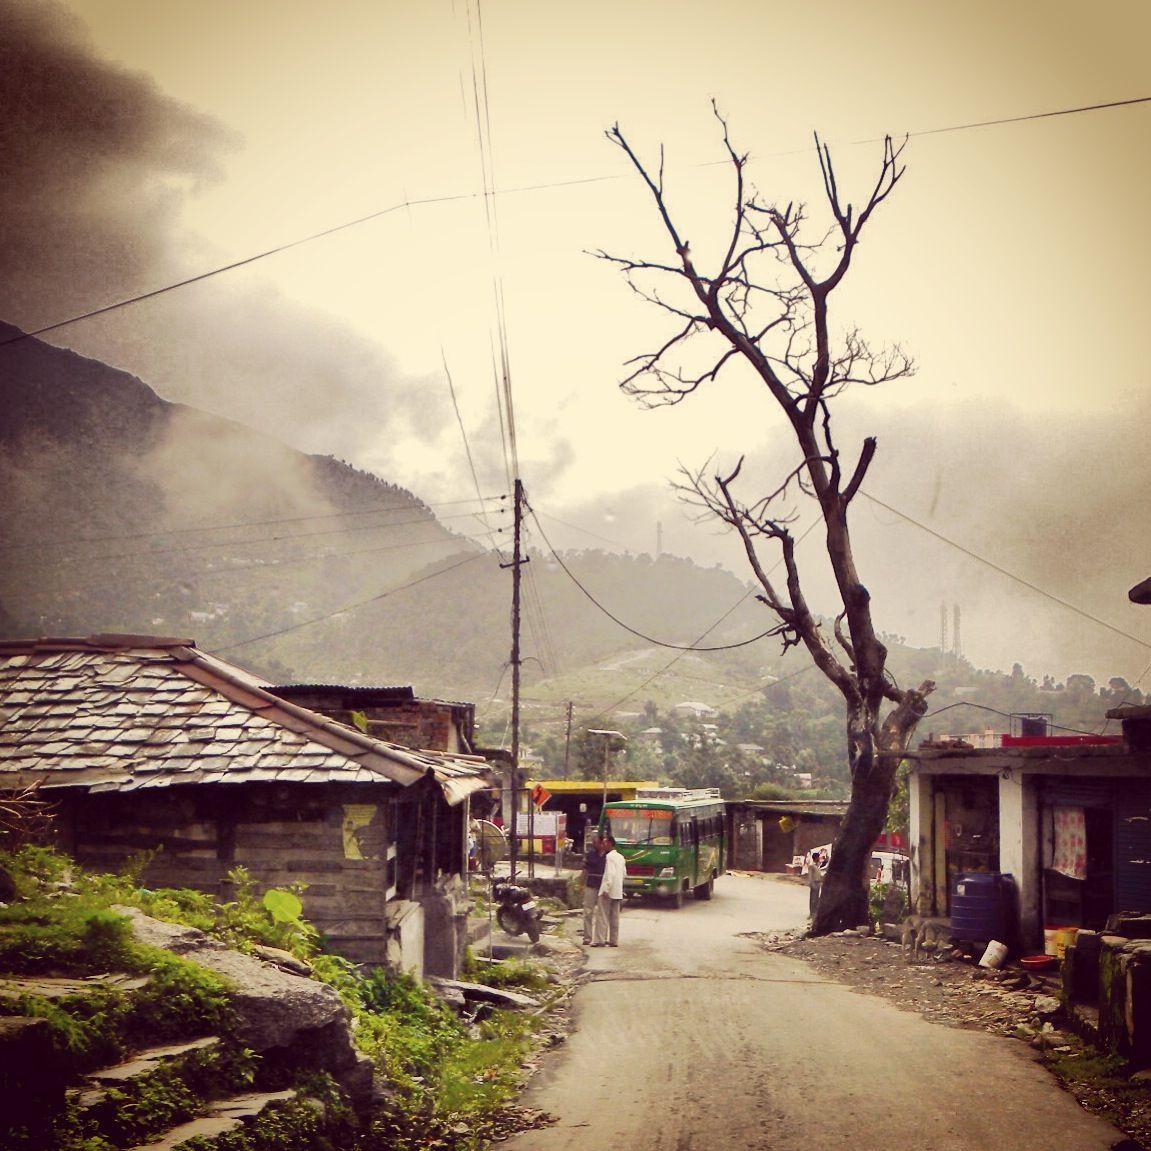 Dharamsala, India Incredible india, Dharamsala, Himalayas